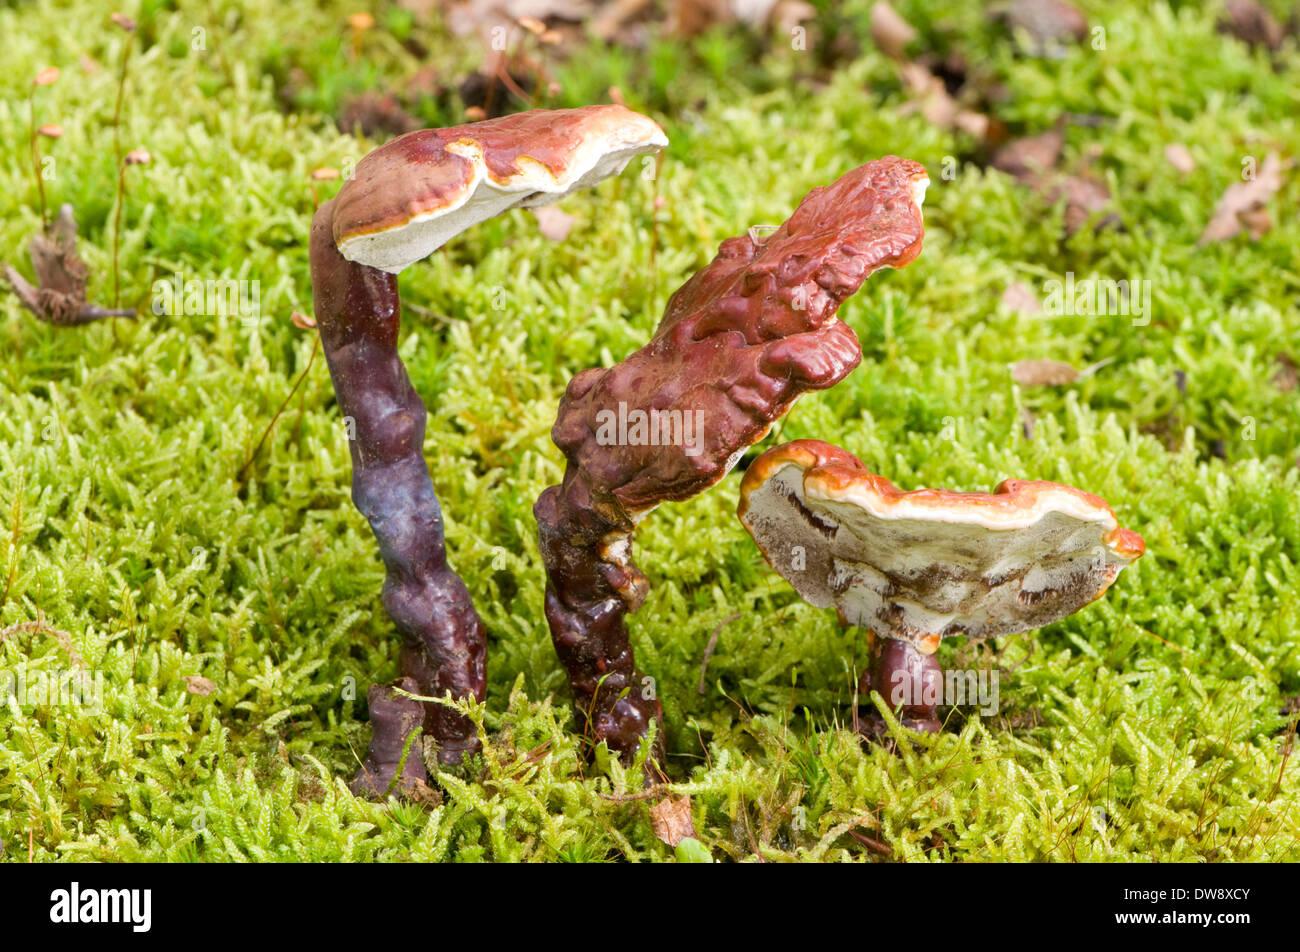 Fungus, Reishi Mushroom - Stock Image